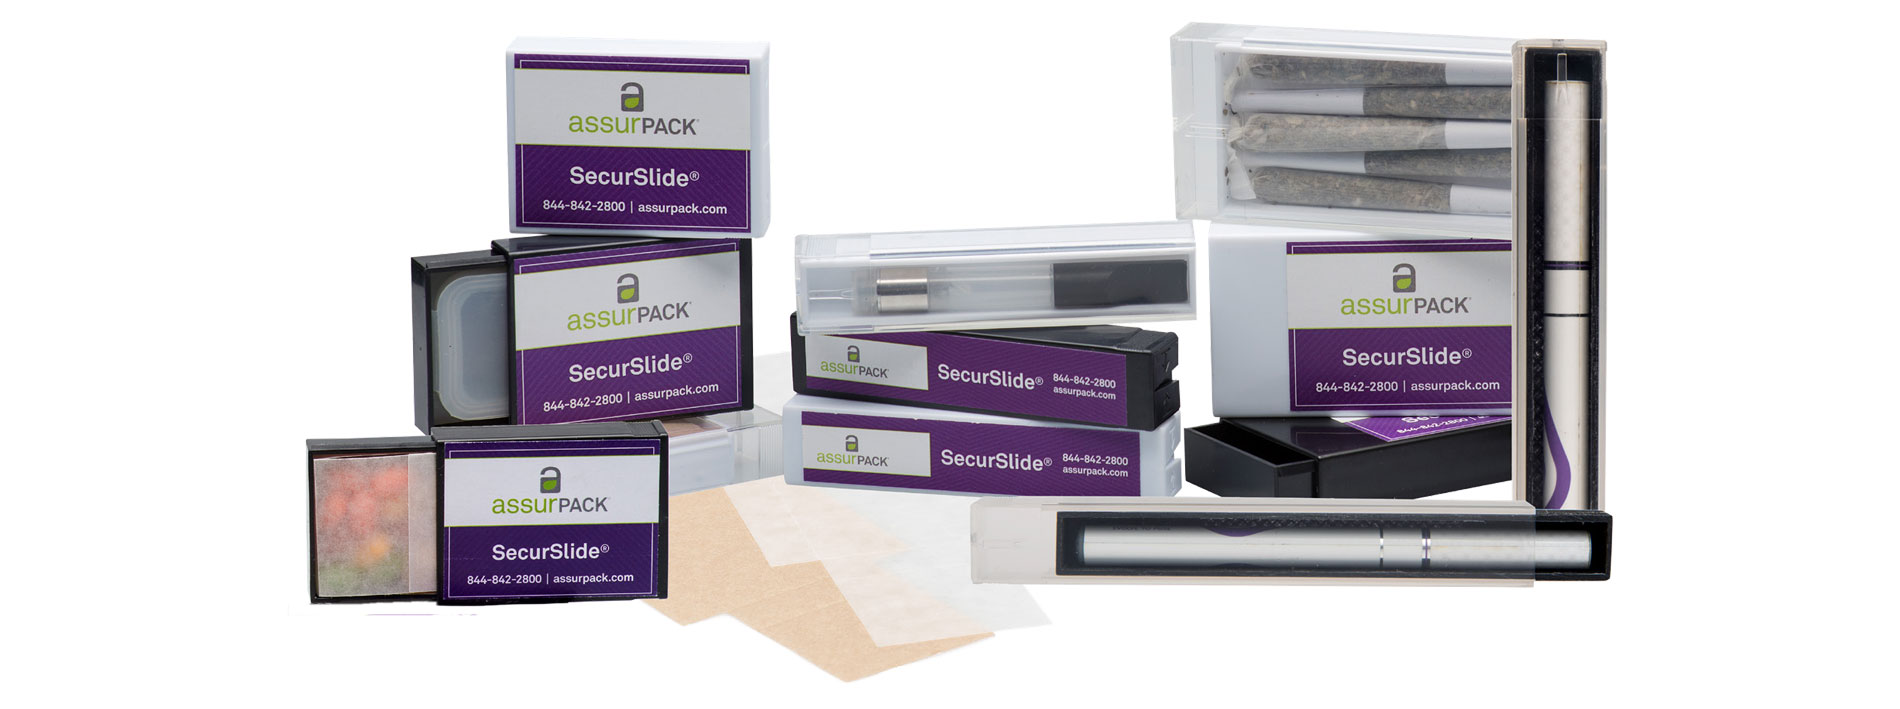 AssurPACK SecurSlide®. Preroll, concentrate, and vape cartridge packaging